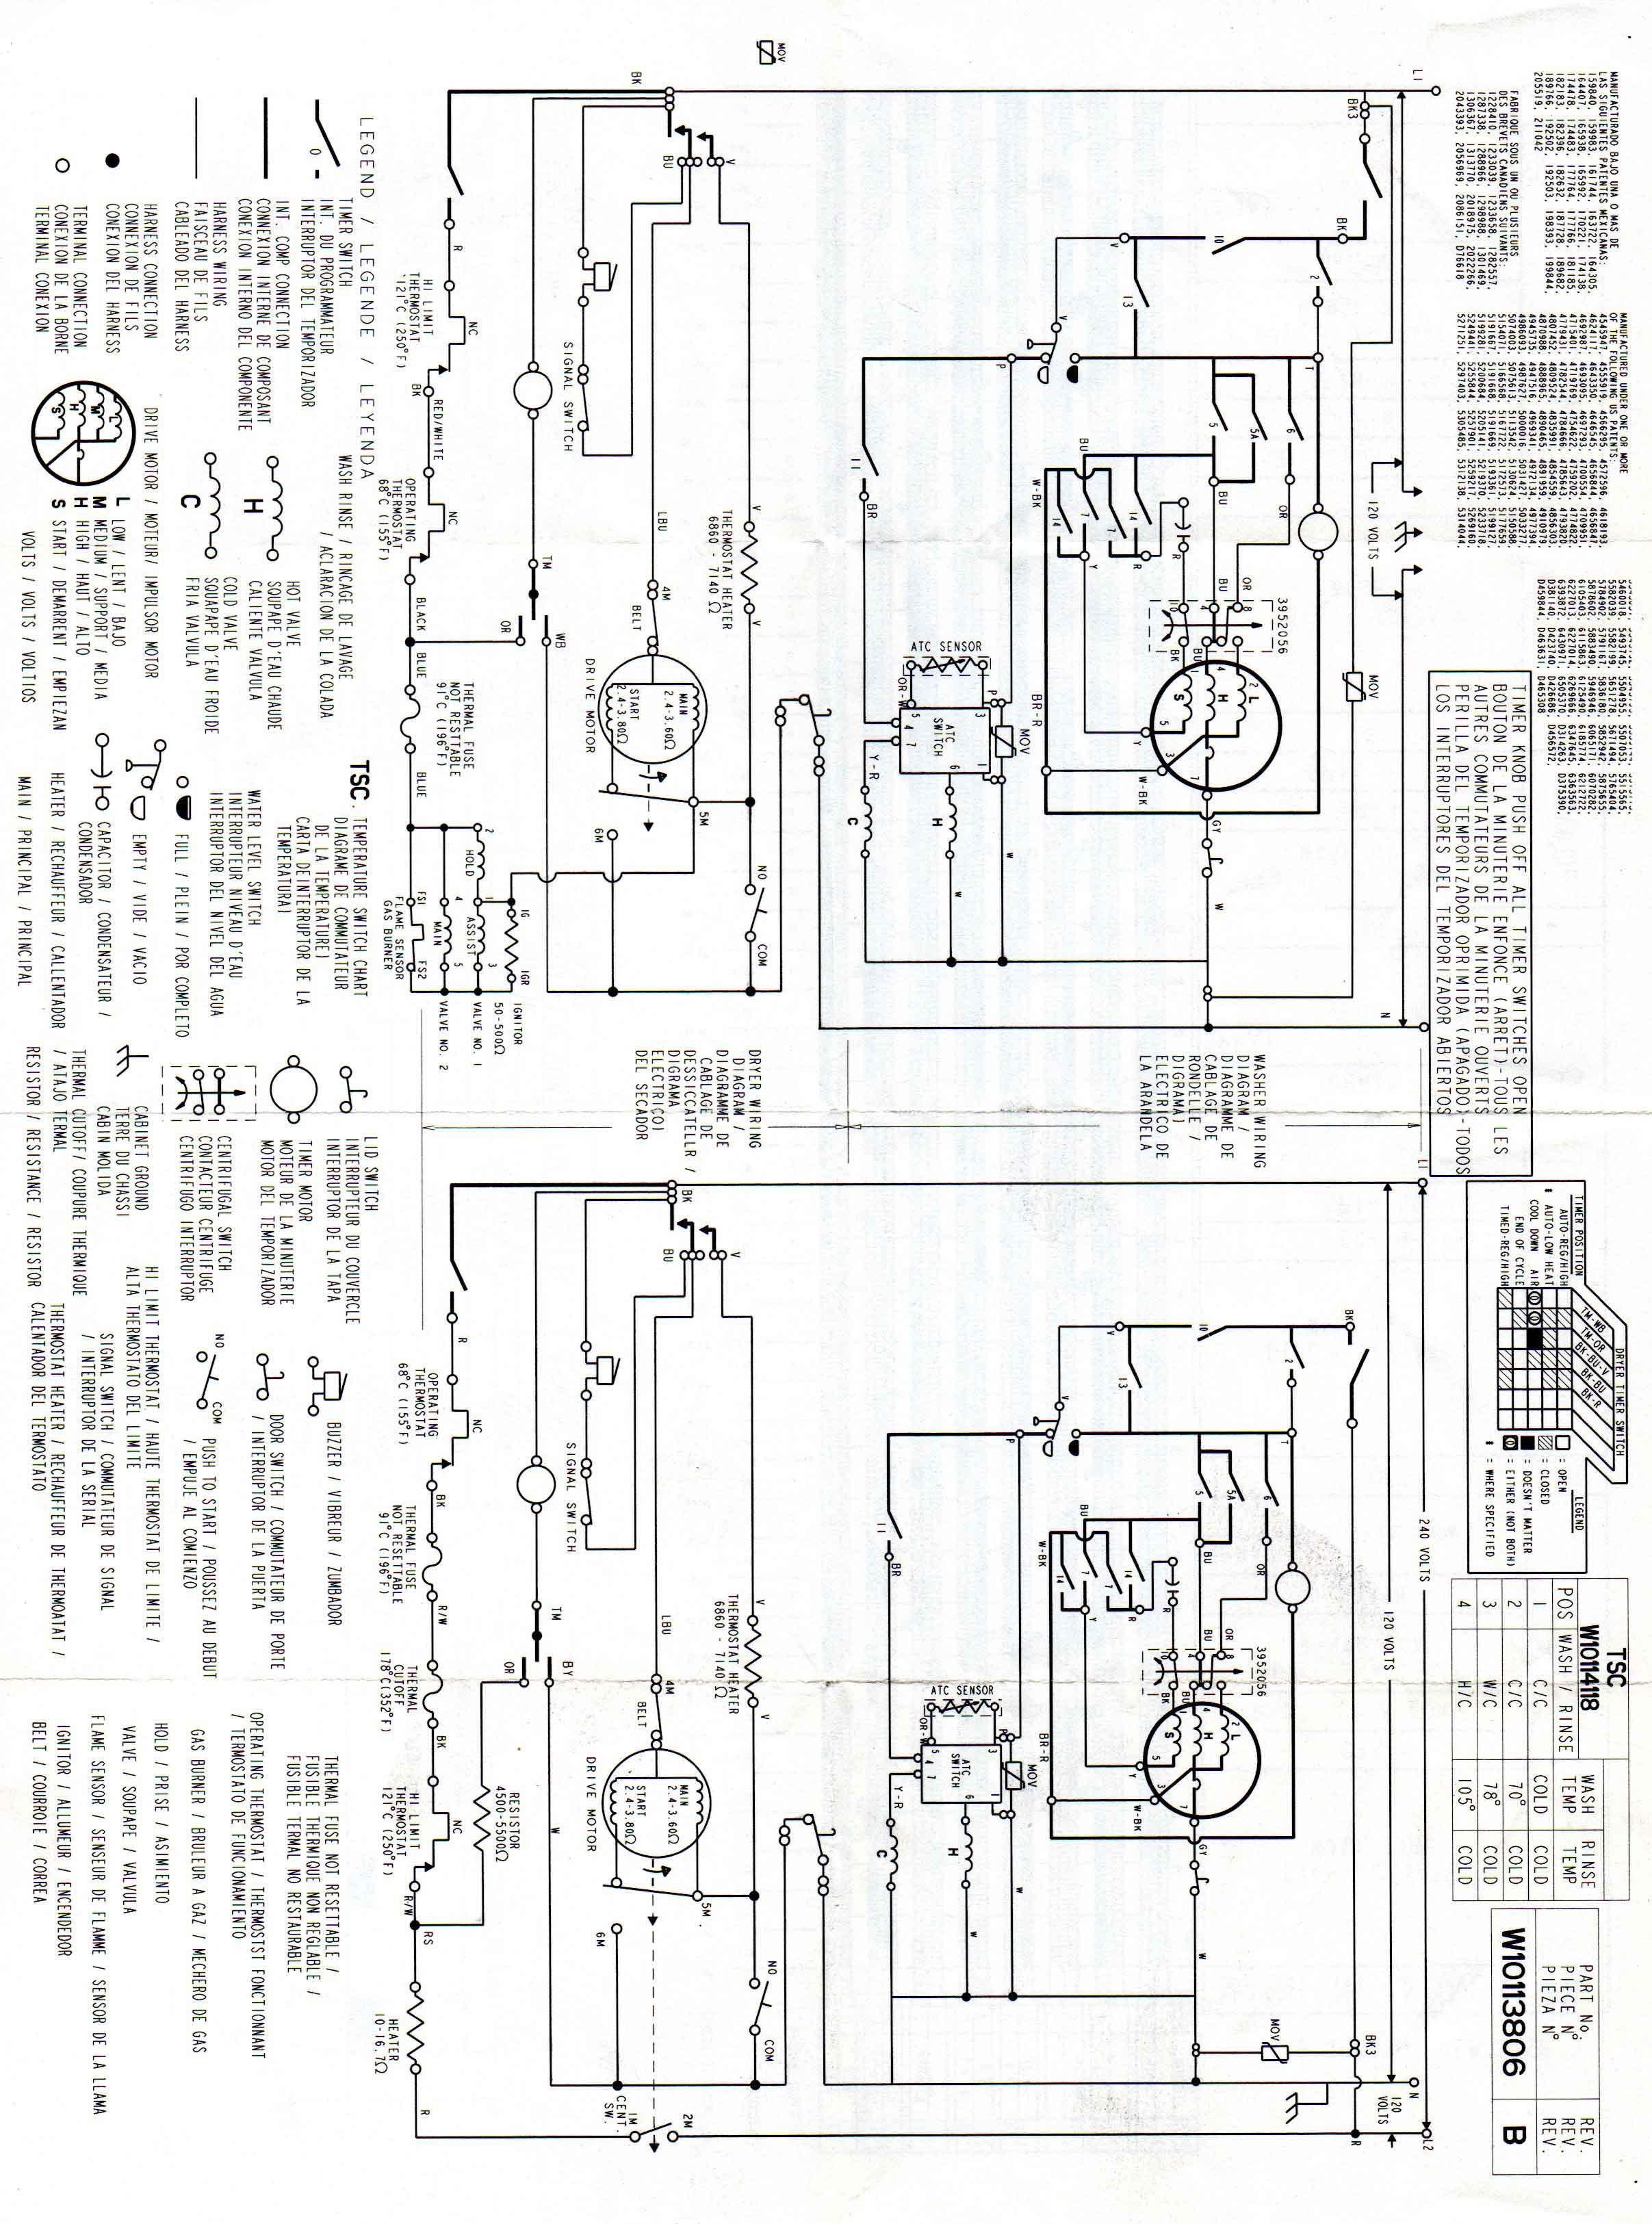 Solucionado: Como conectar una secadora con 110V que trabaja a 220V ...